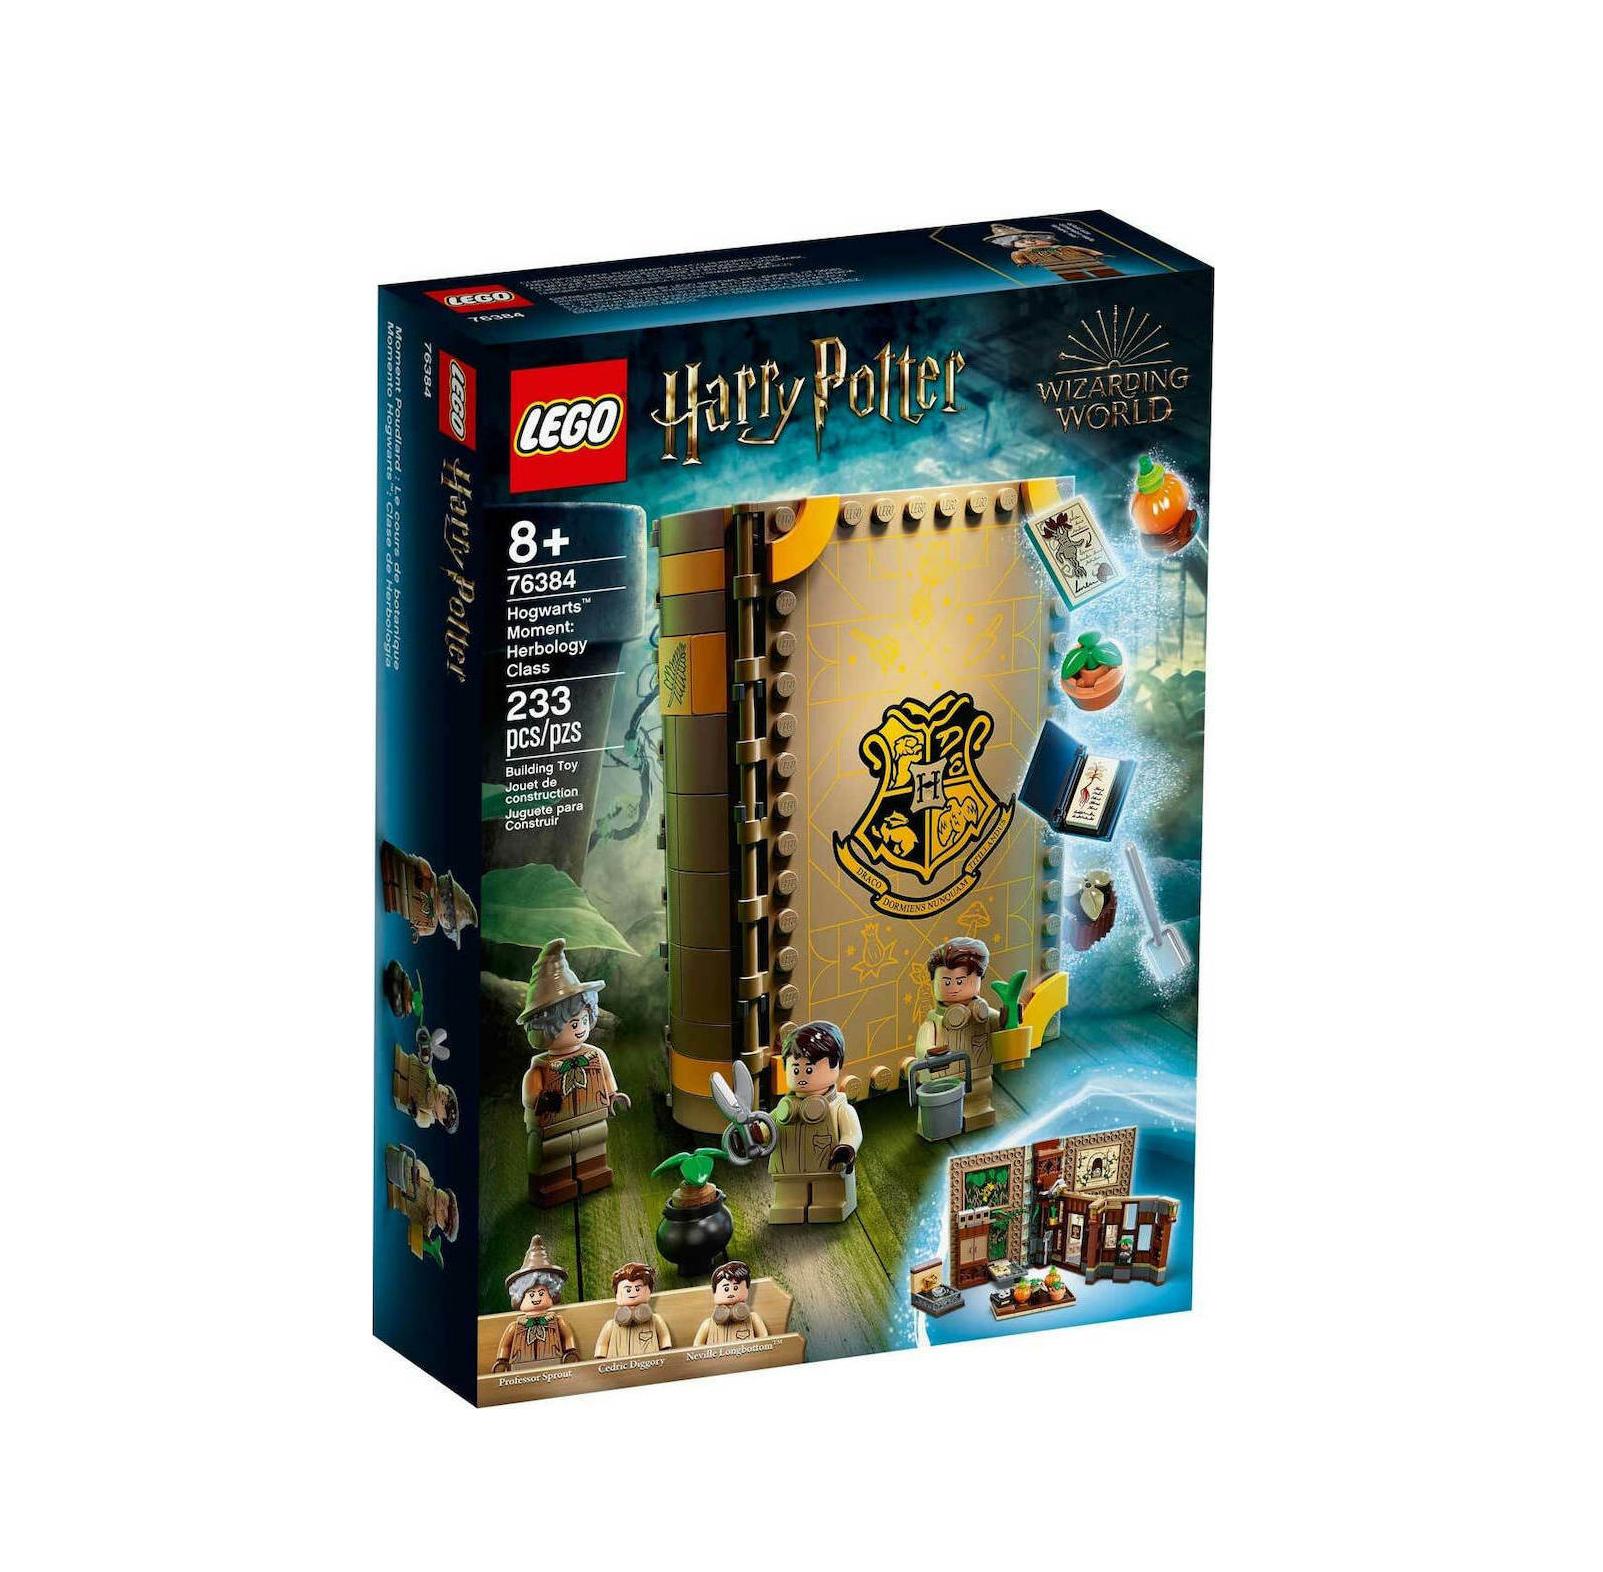 Lego Harry Potter: Hogwarts Moment Herbology Class 76384